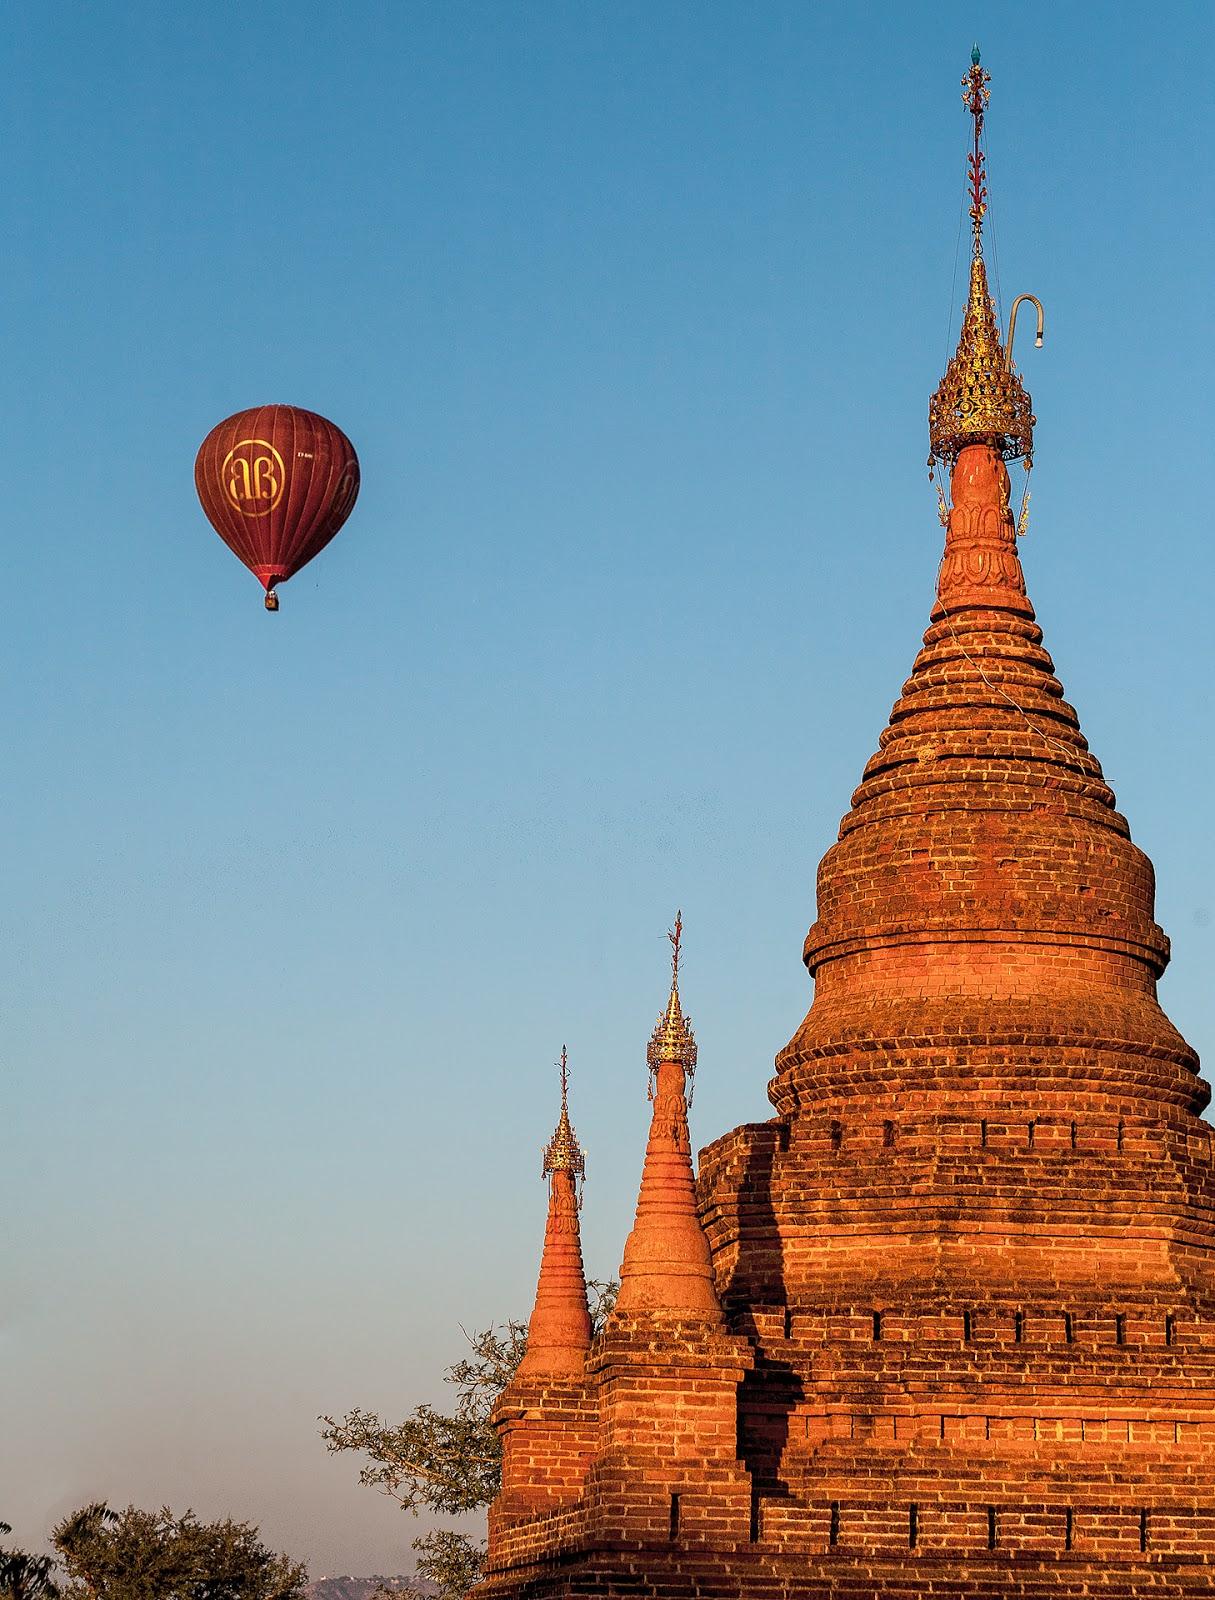 bagan,birma,balony,pagody